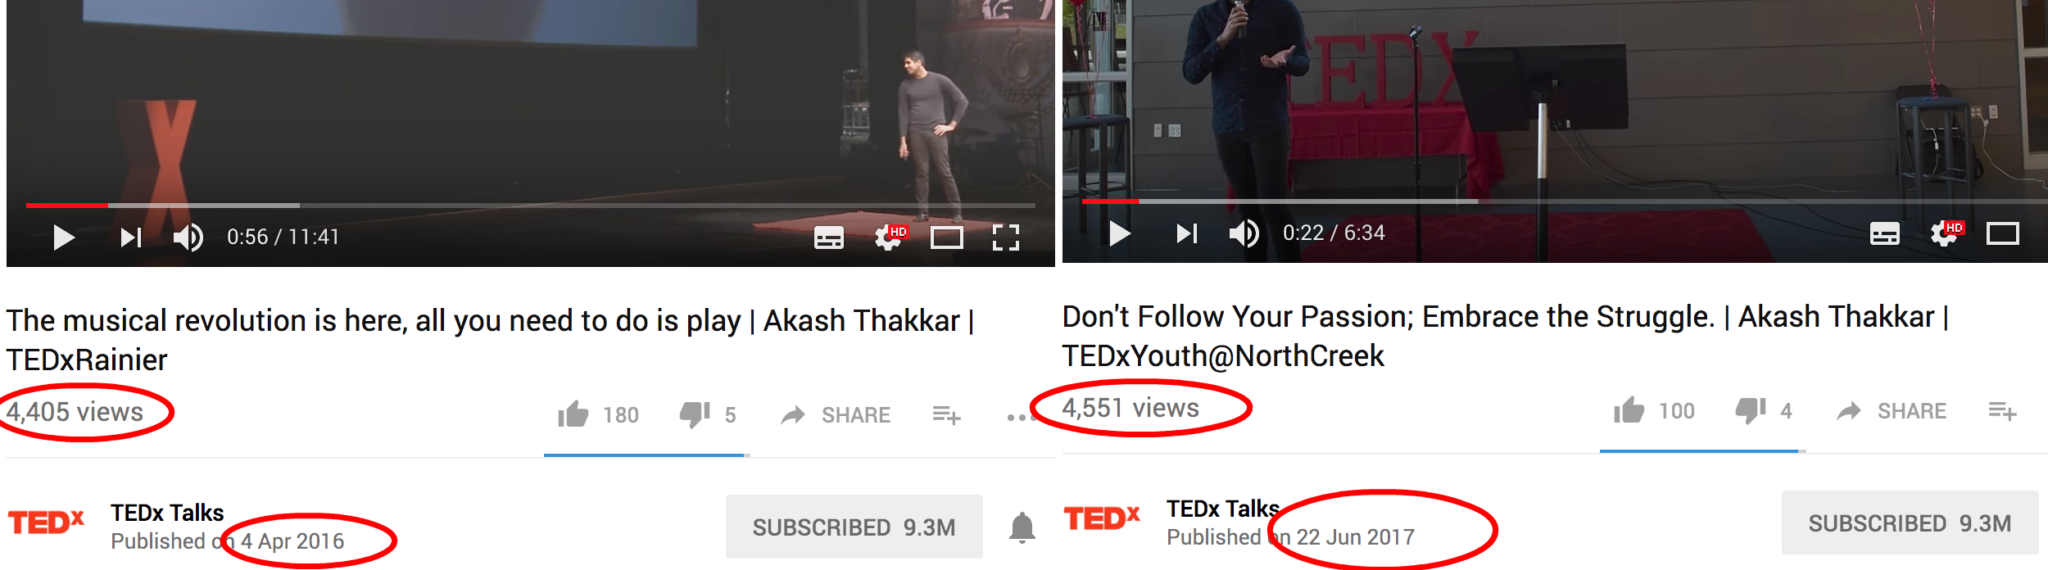 Video views comparison same speaker different quality